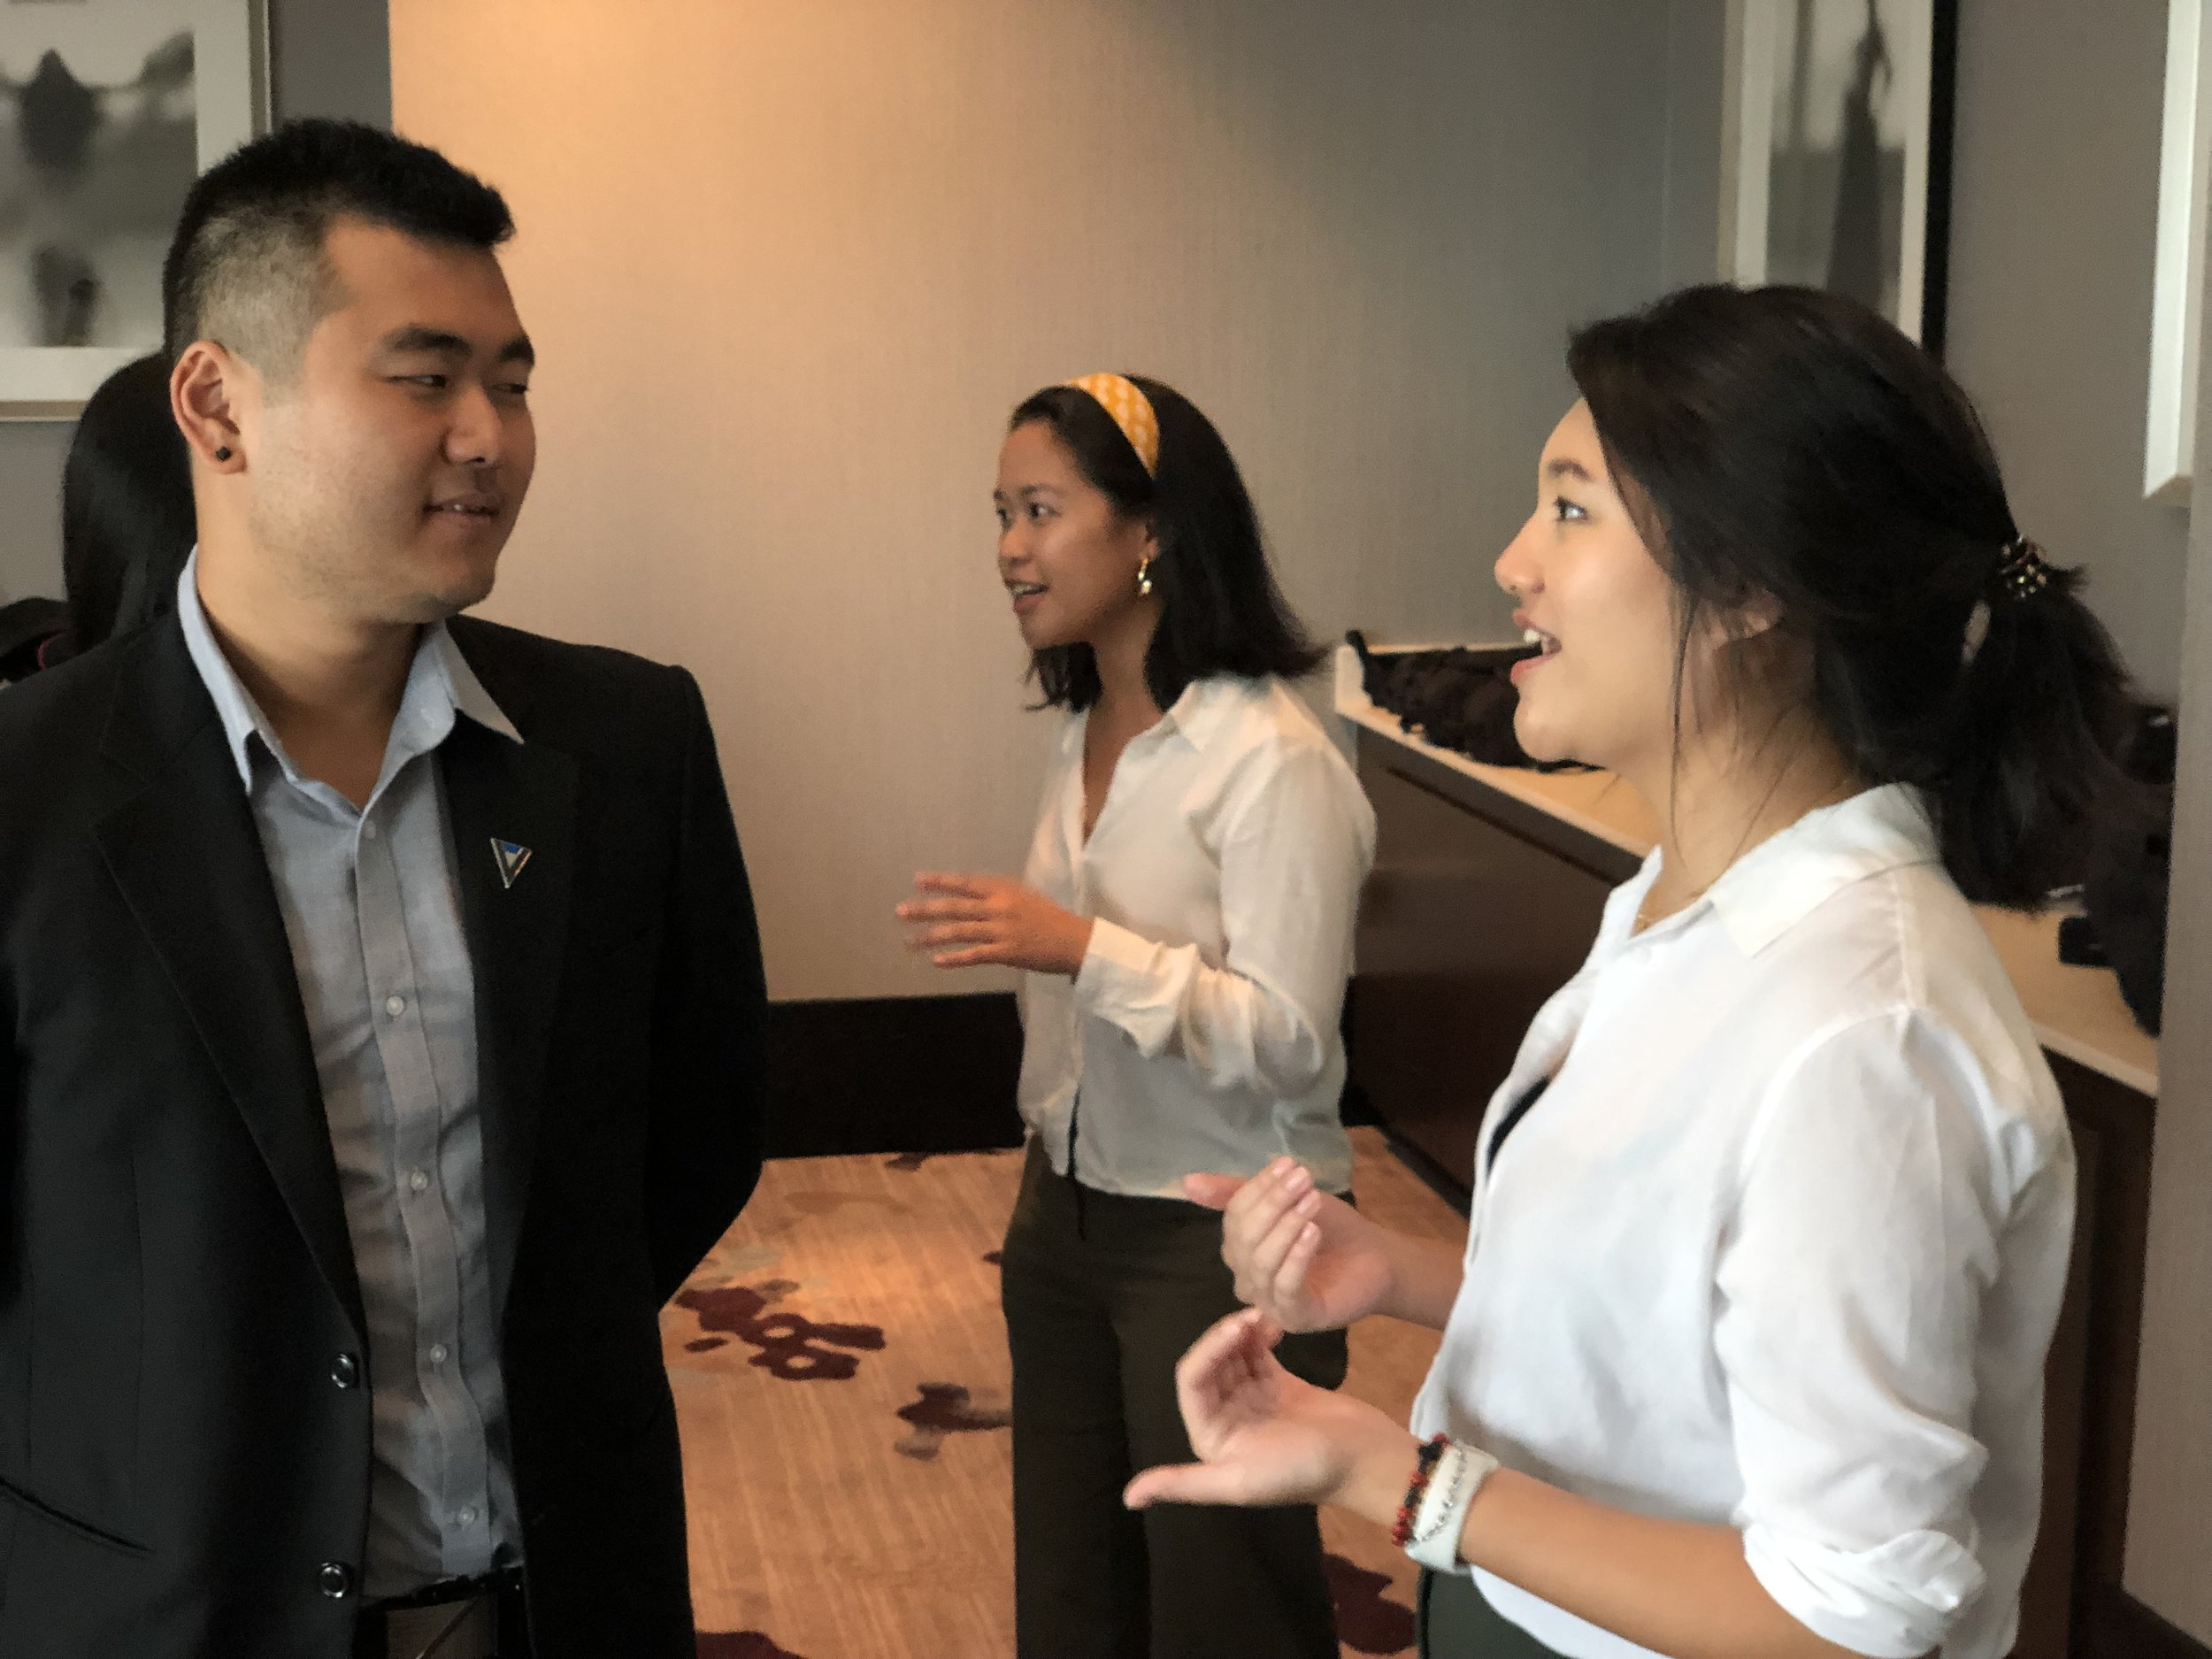 Souichi Terada and Alyssa Ramos practice networking skills.